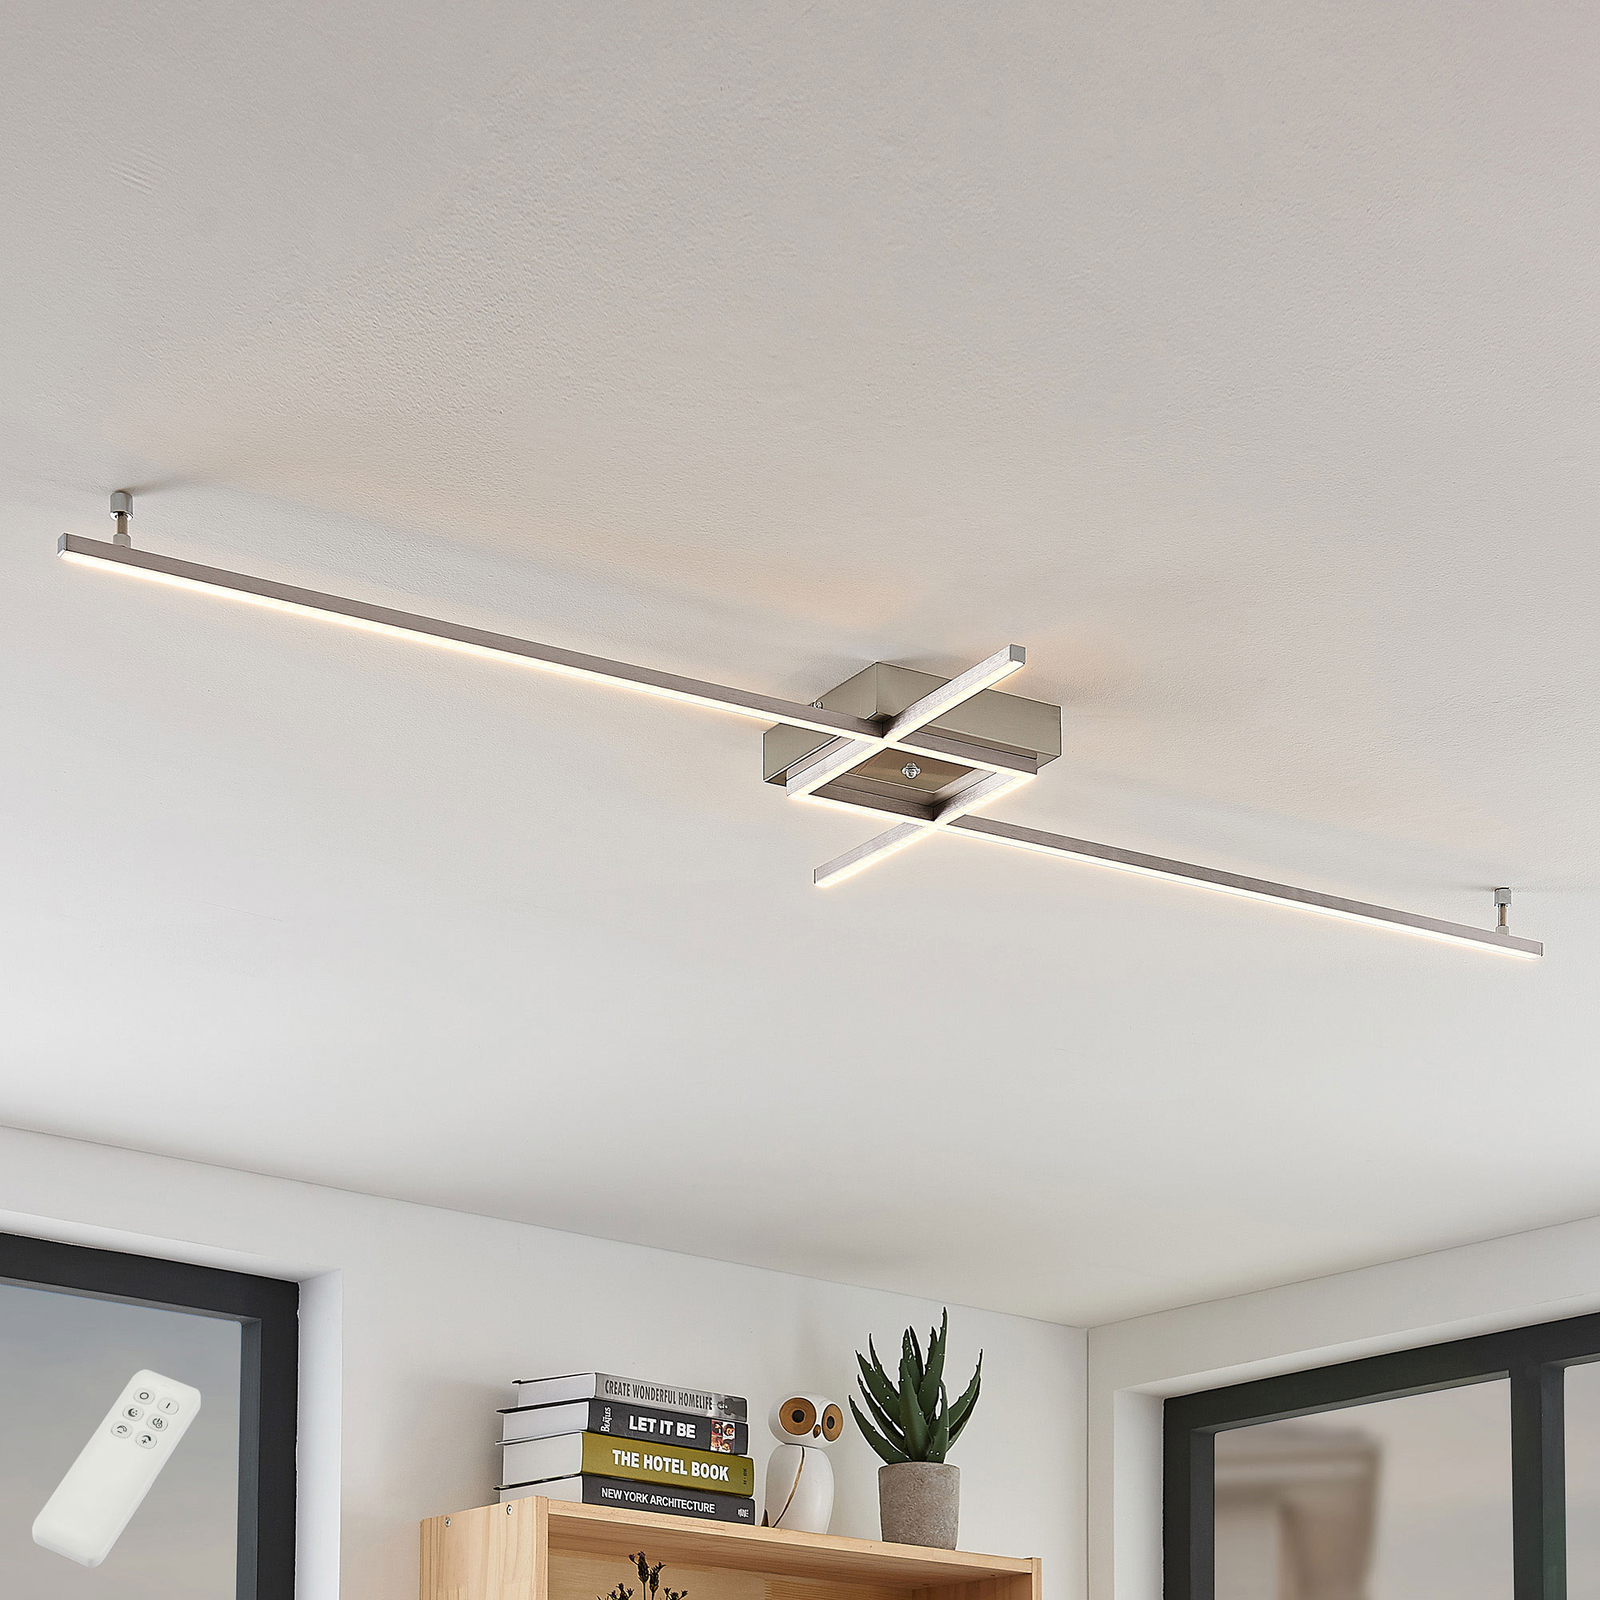 Keki Led Ceiling Light With Remote Control Lights Co Uk